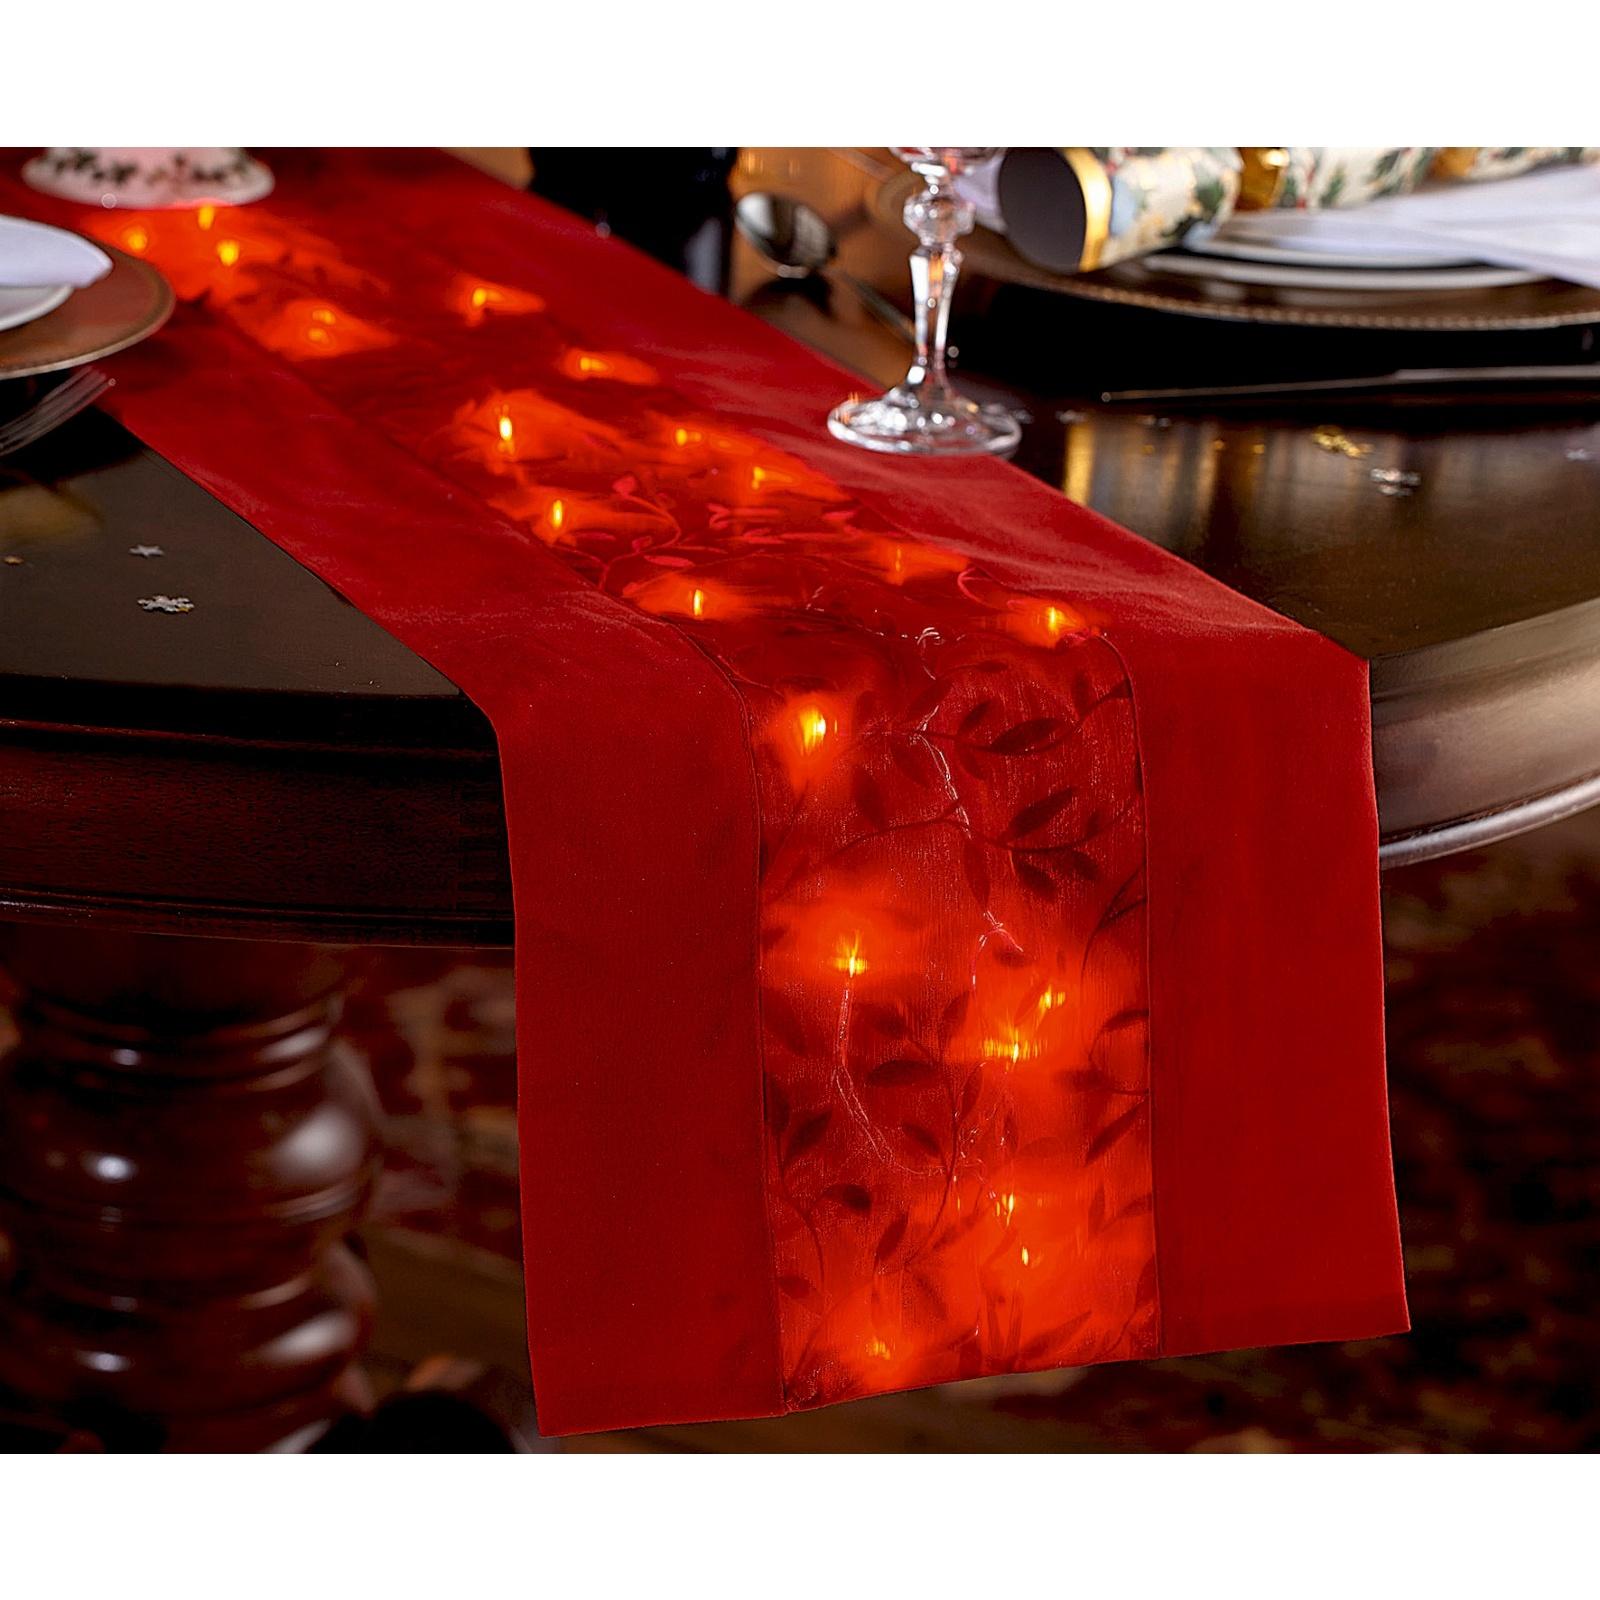 Red Fabric Dining Table Runner Warm White Led Lights Christmas Dinner Decoration 5053335773892 Ebay